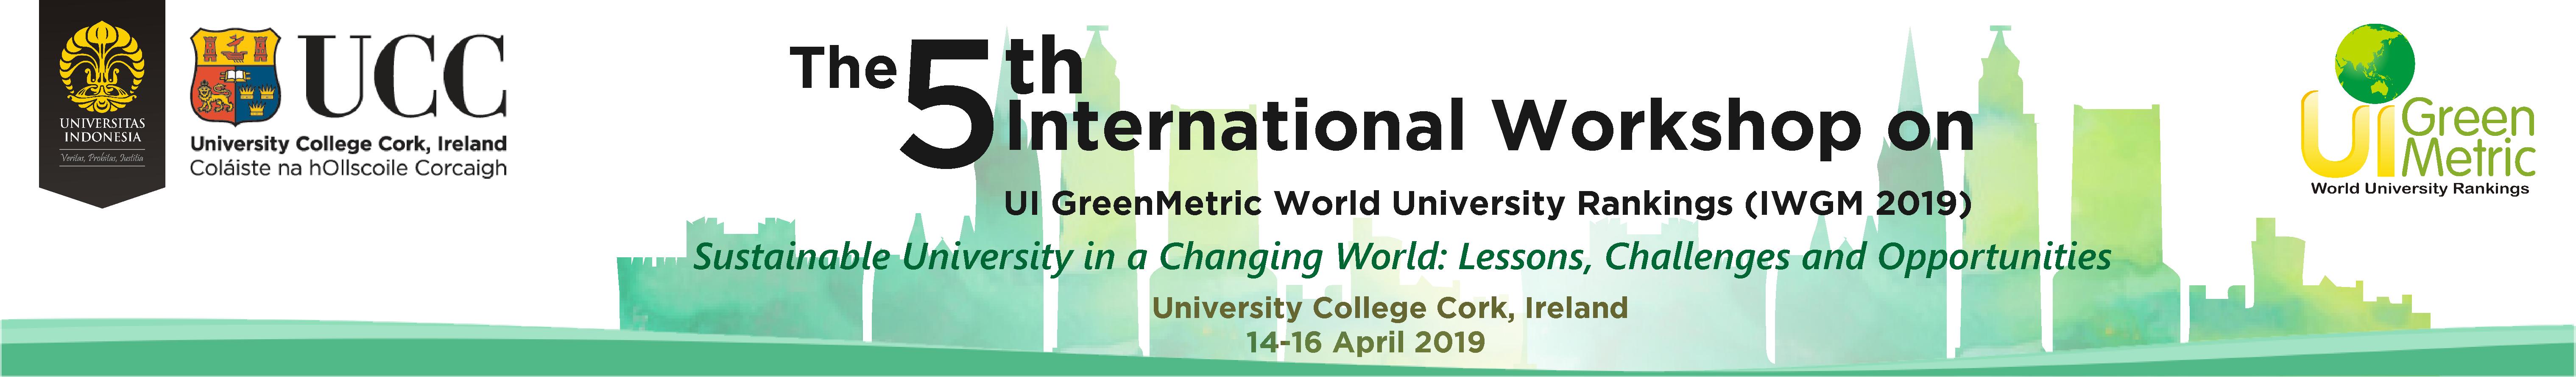 International Workshop on UI GreenMetric